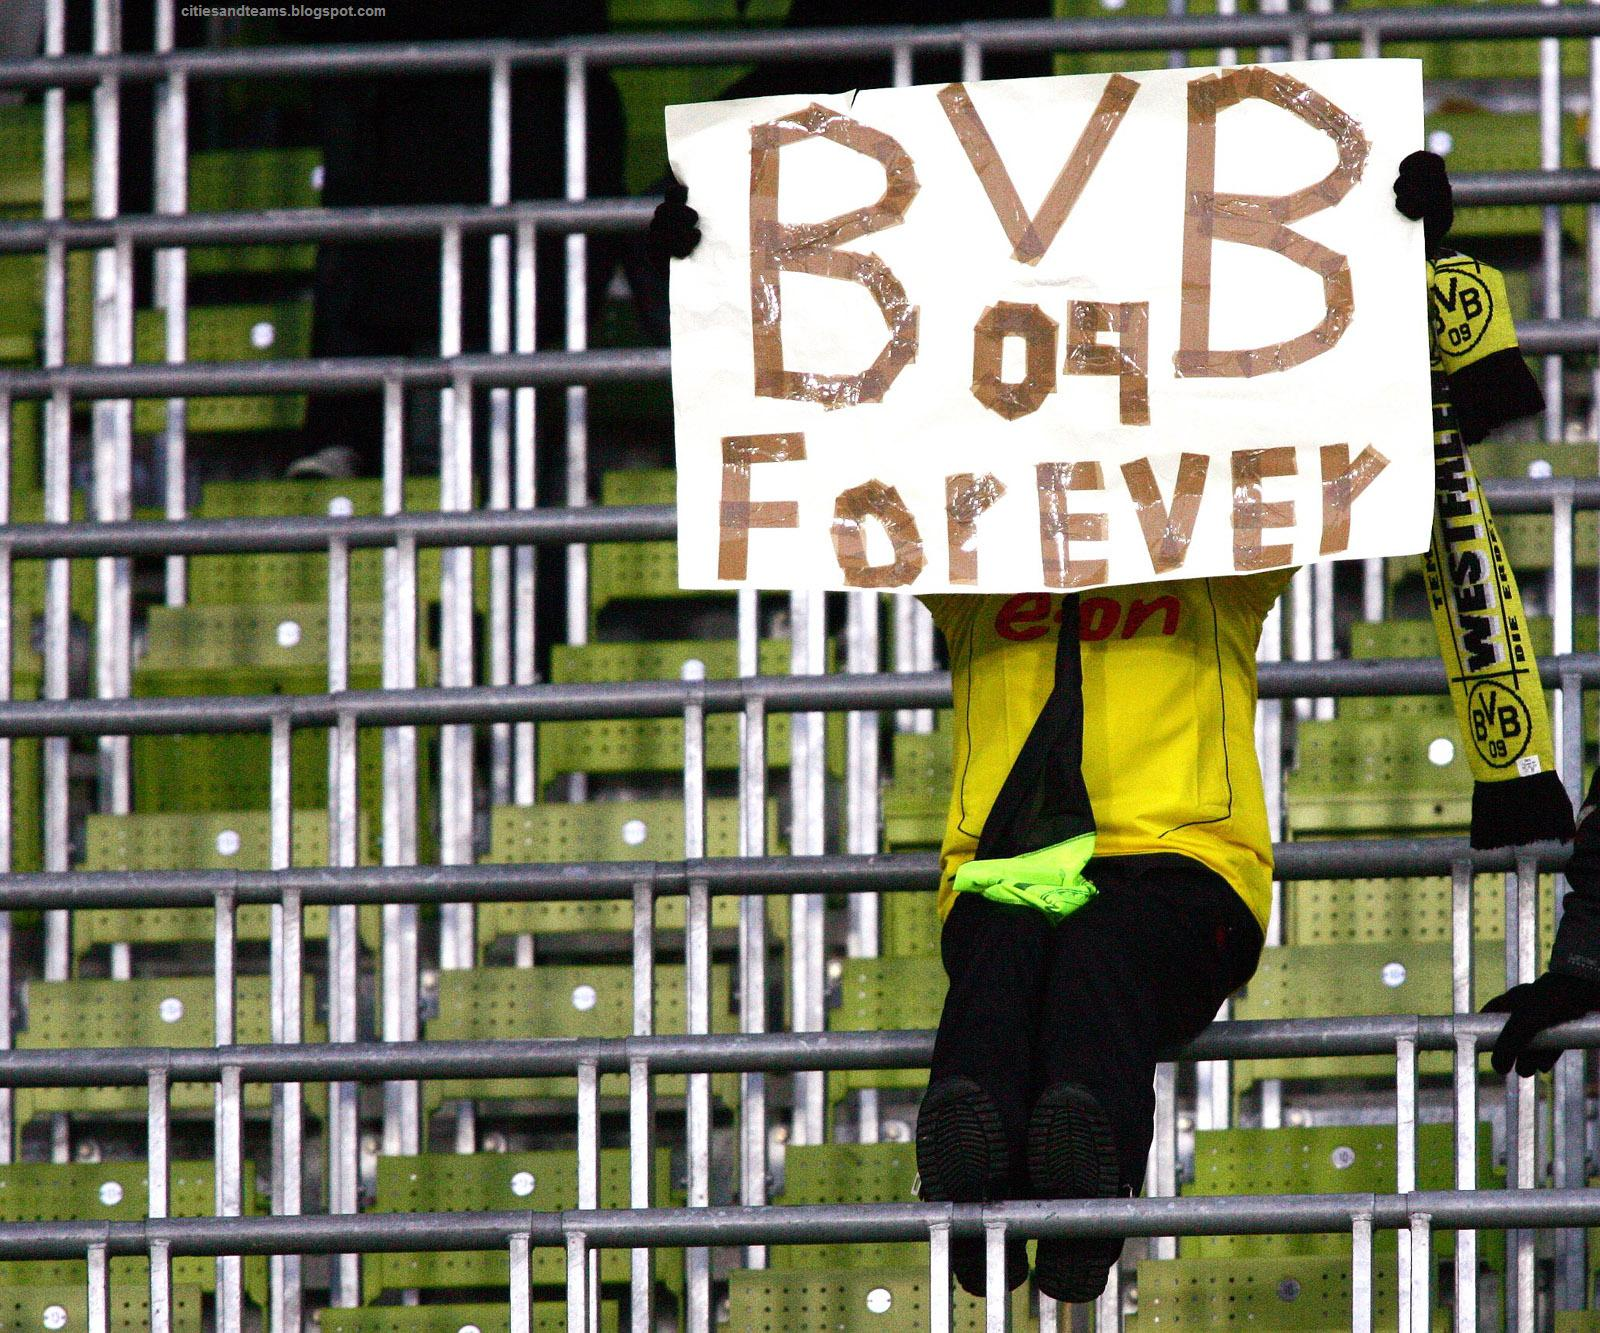 http://4.bp.blogspot.com/-vlPIYQeM3m4/T5nBdplp0yI/AAAAAAAAGE4/LJ8Pwvqj-Gc/s1600/Bvb_09_Forever_Borussia_Dortmund_Wallpaper_Hd_Desktop_Champion_Germany_German_Bundesliga_citiesandteams.blogspot.com.jpg